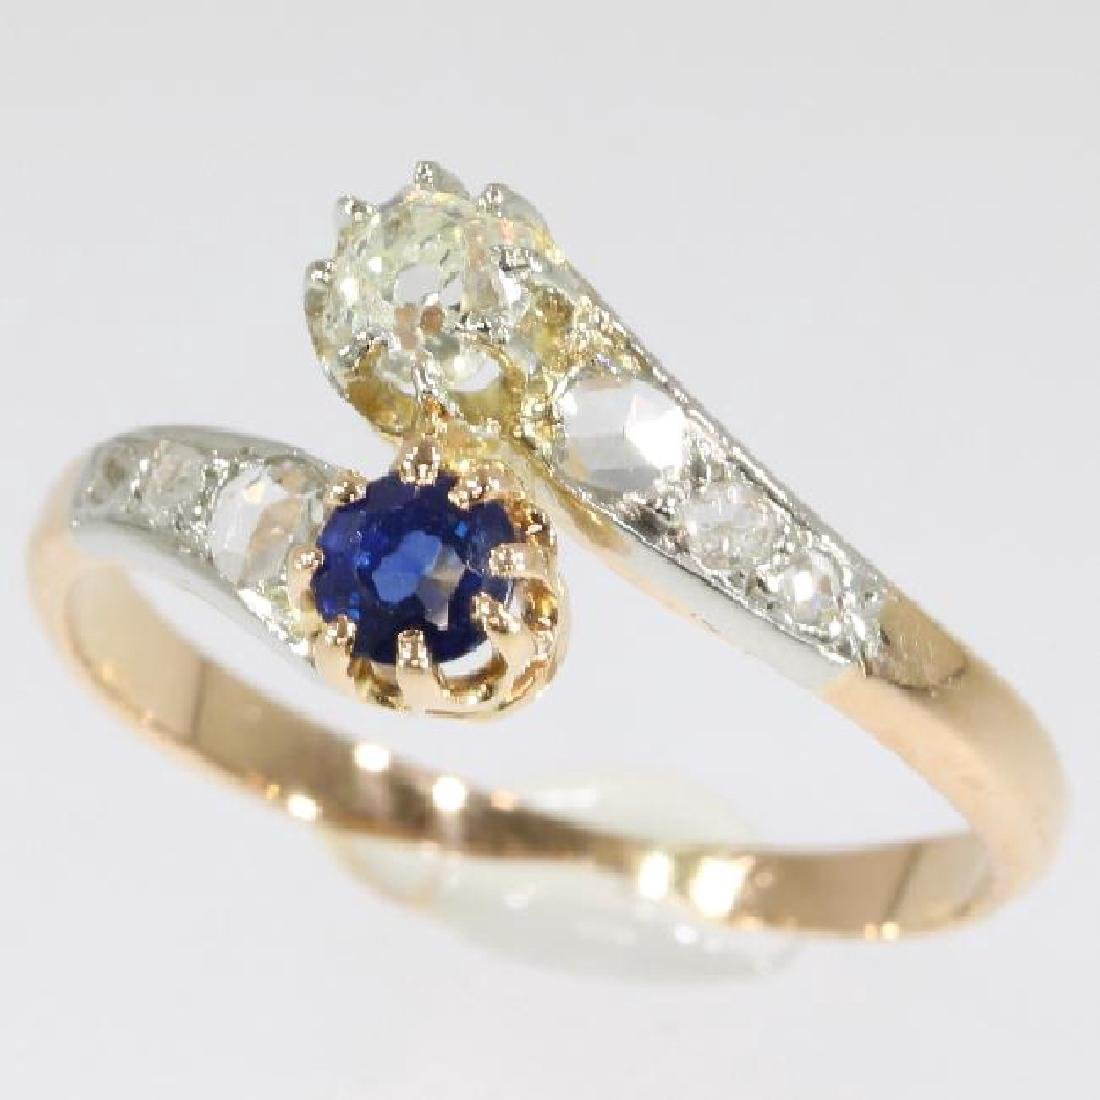 Antique 18K Gold Sapphire Diamond Toi et Moi Ring